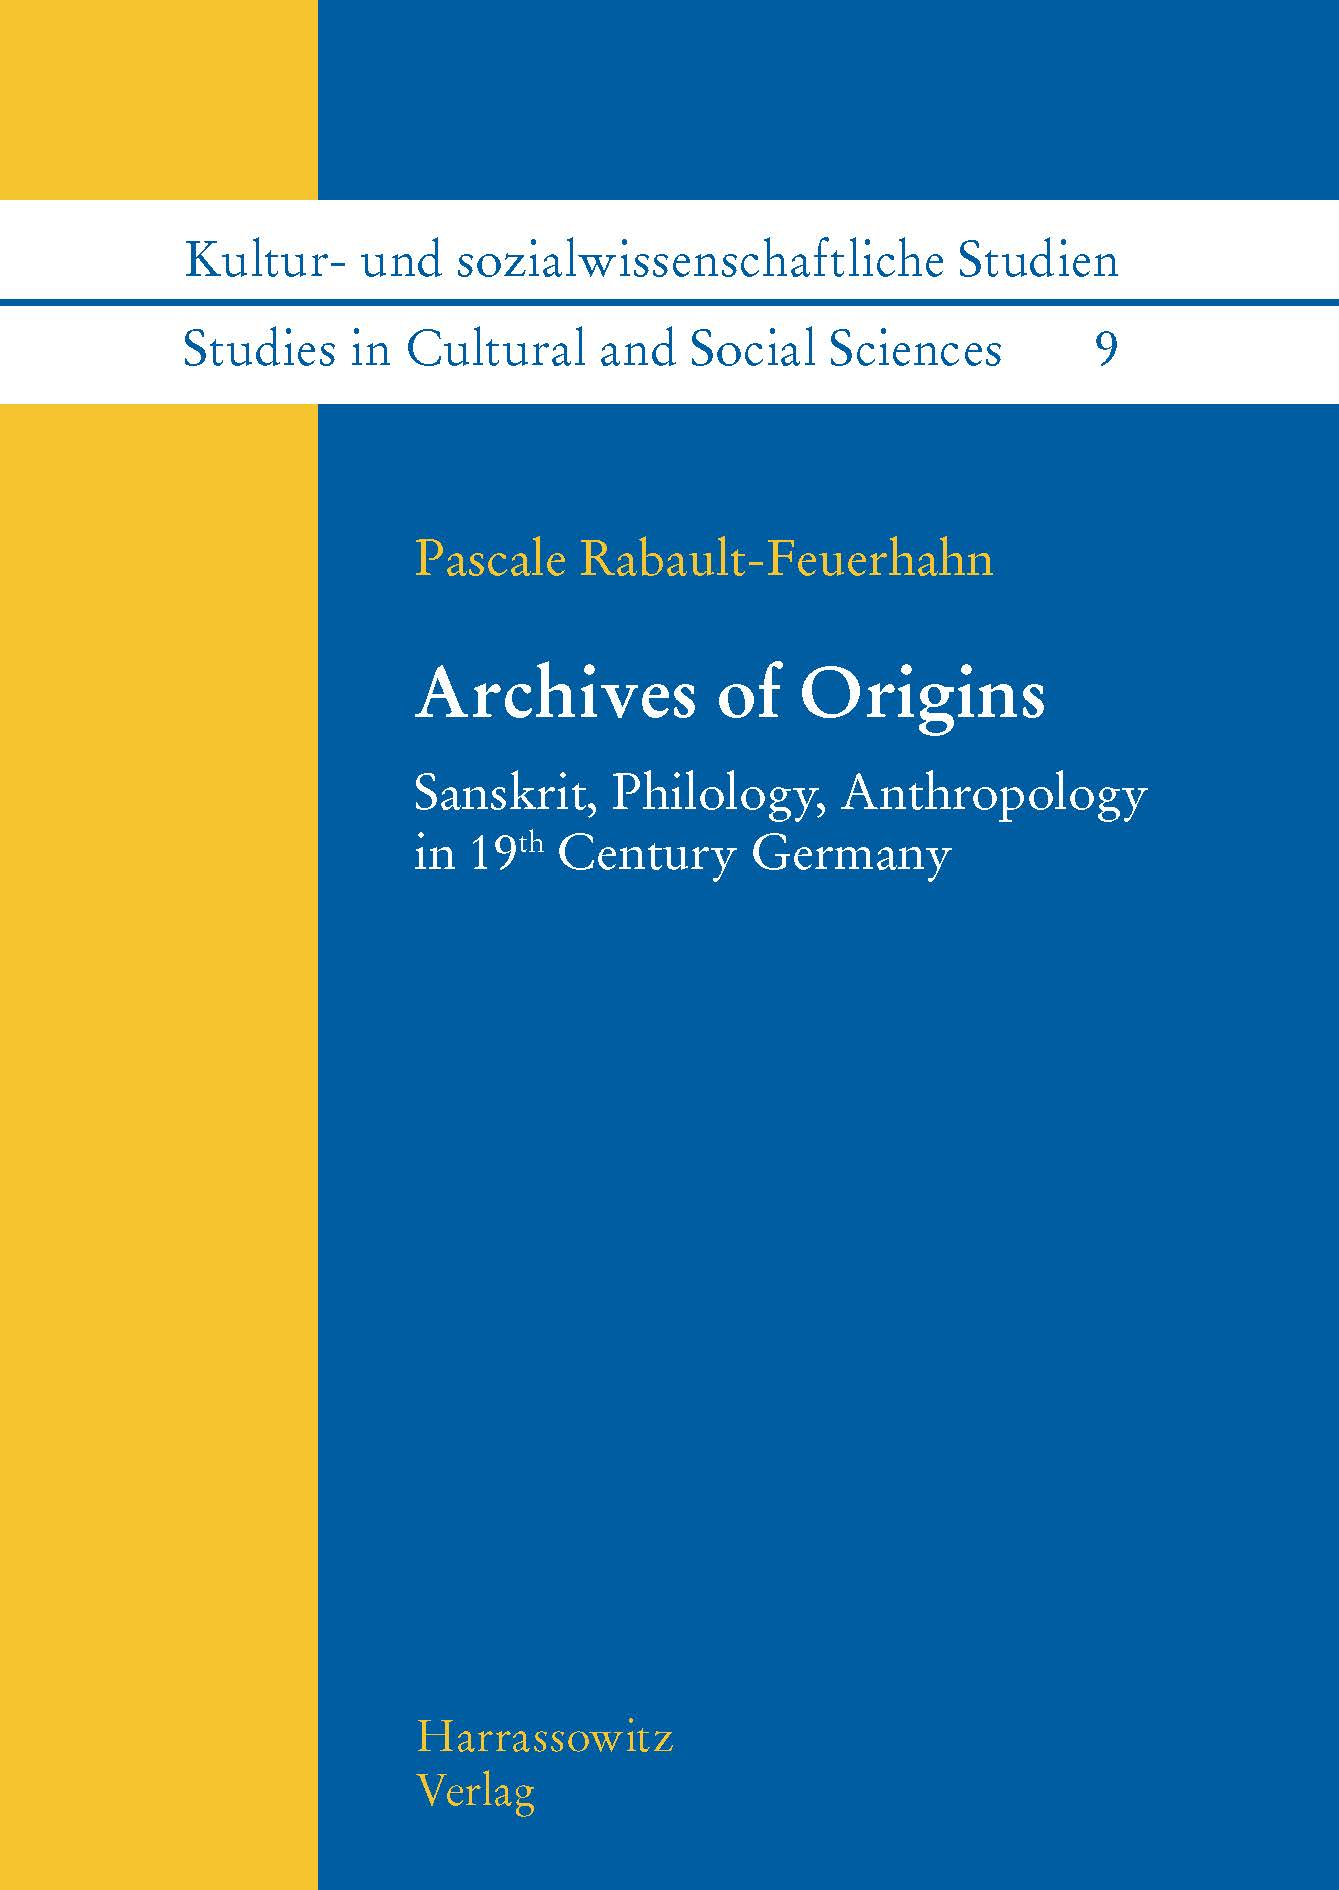 Archives of Origins Pascale Rabault-Feuerhahn